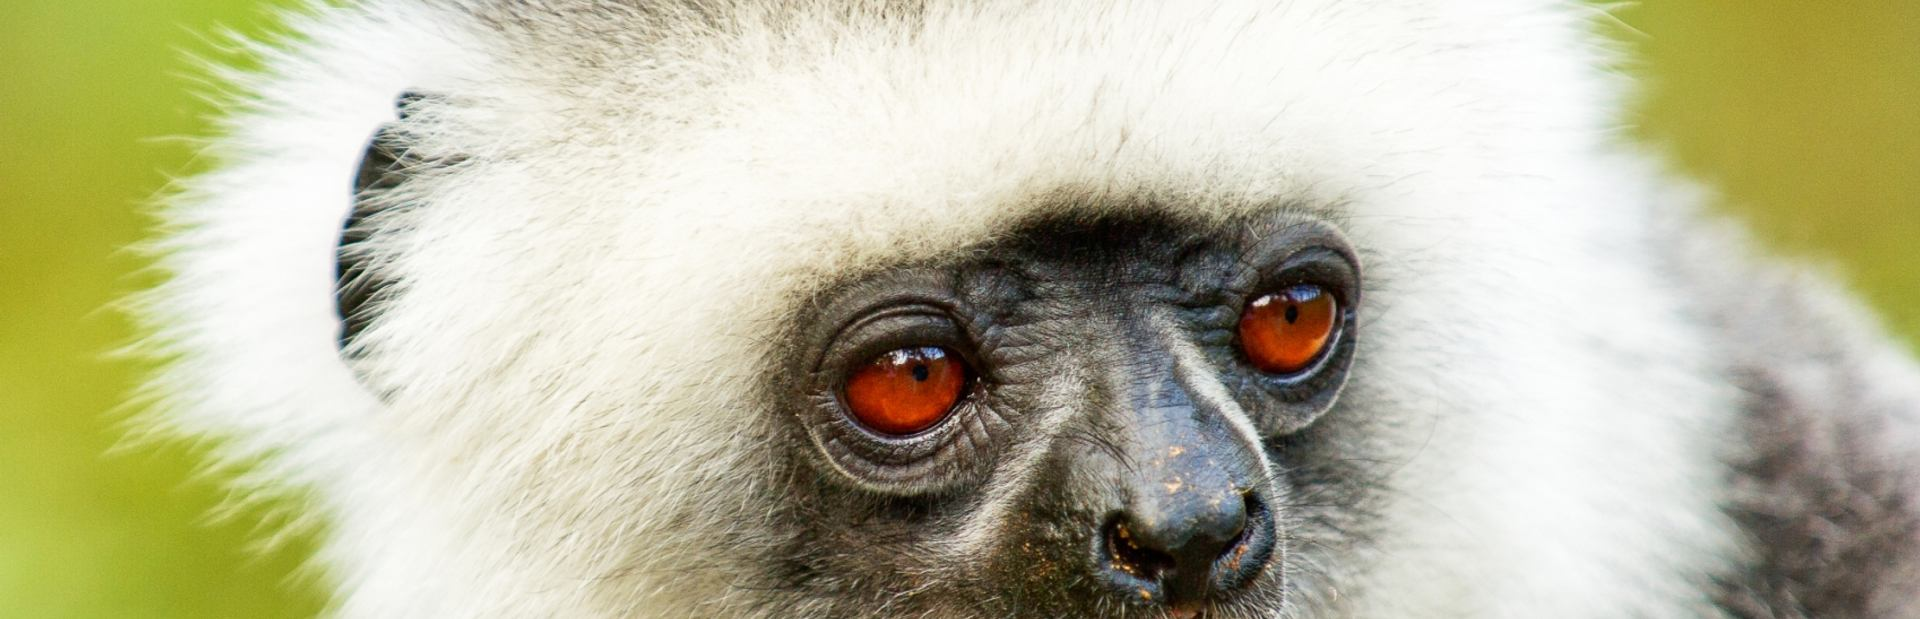 Cute red-eyed lemur